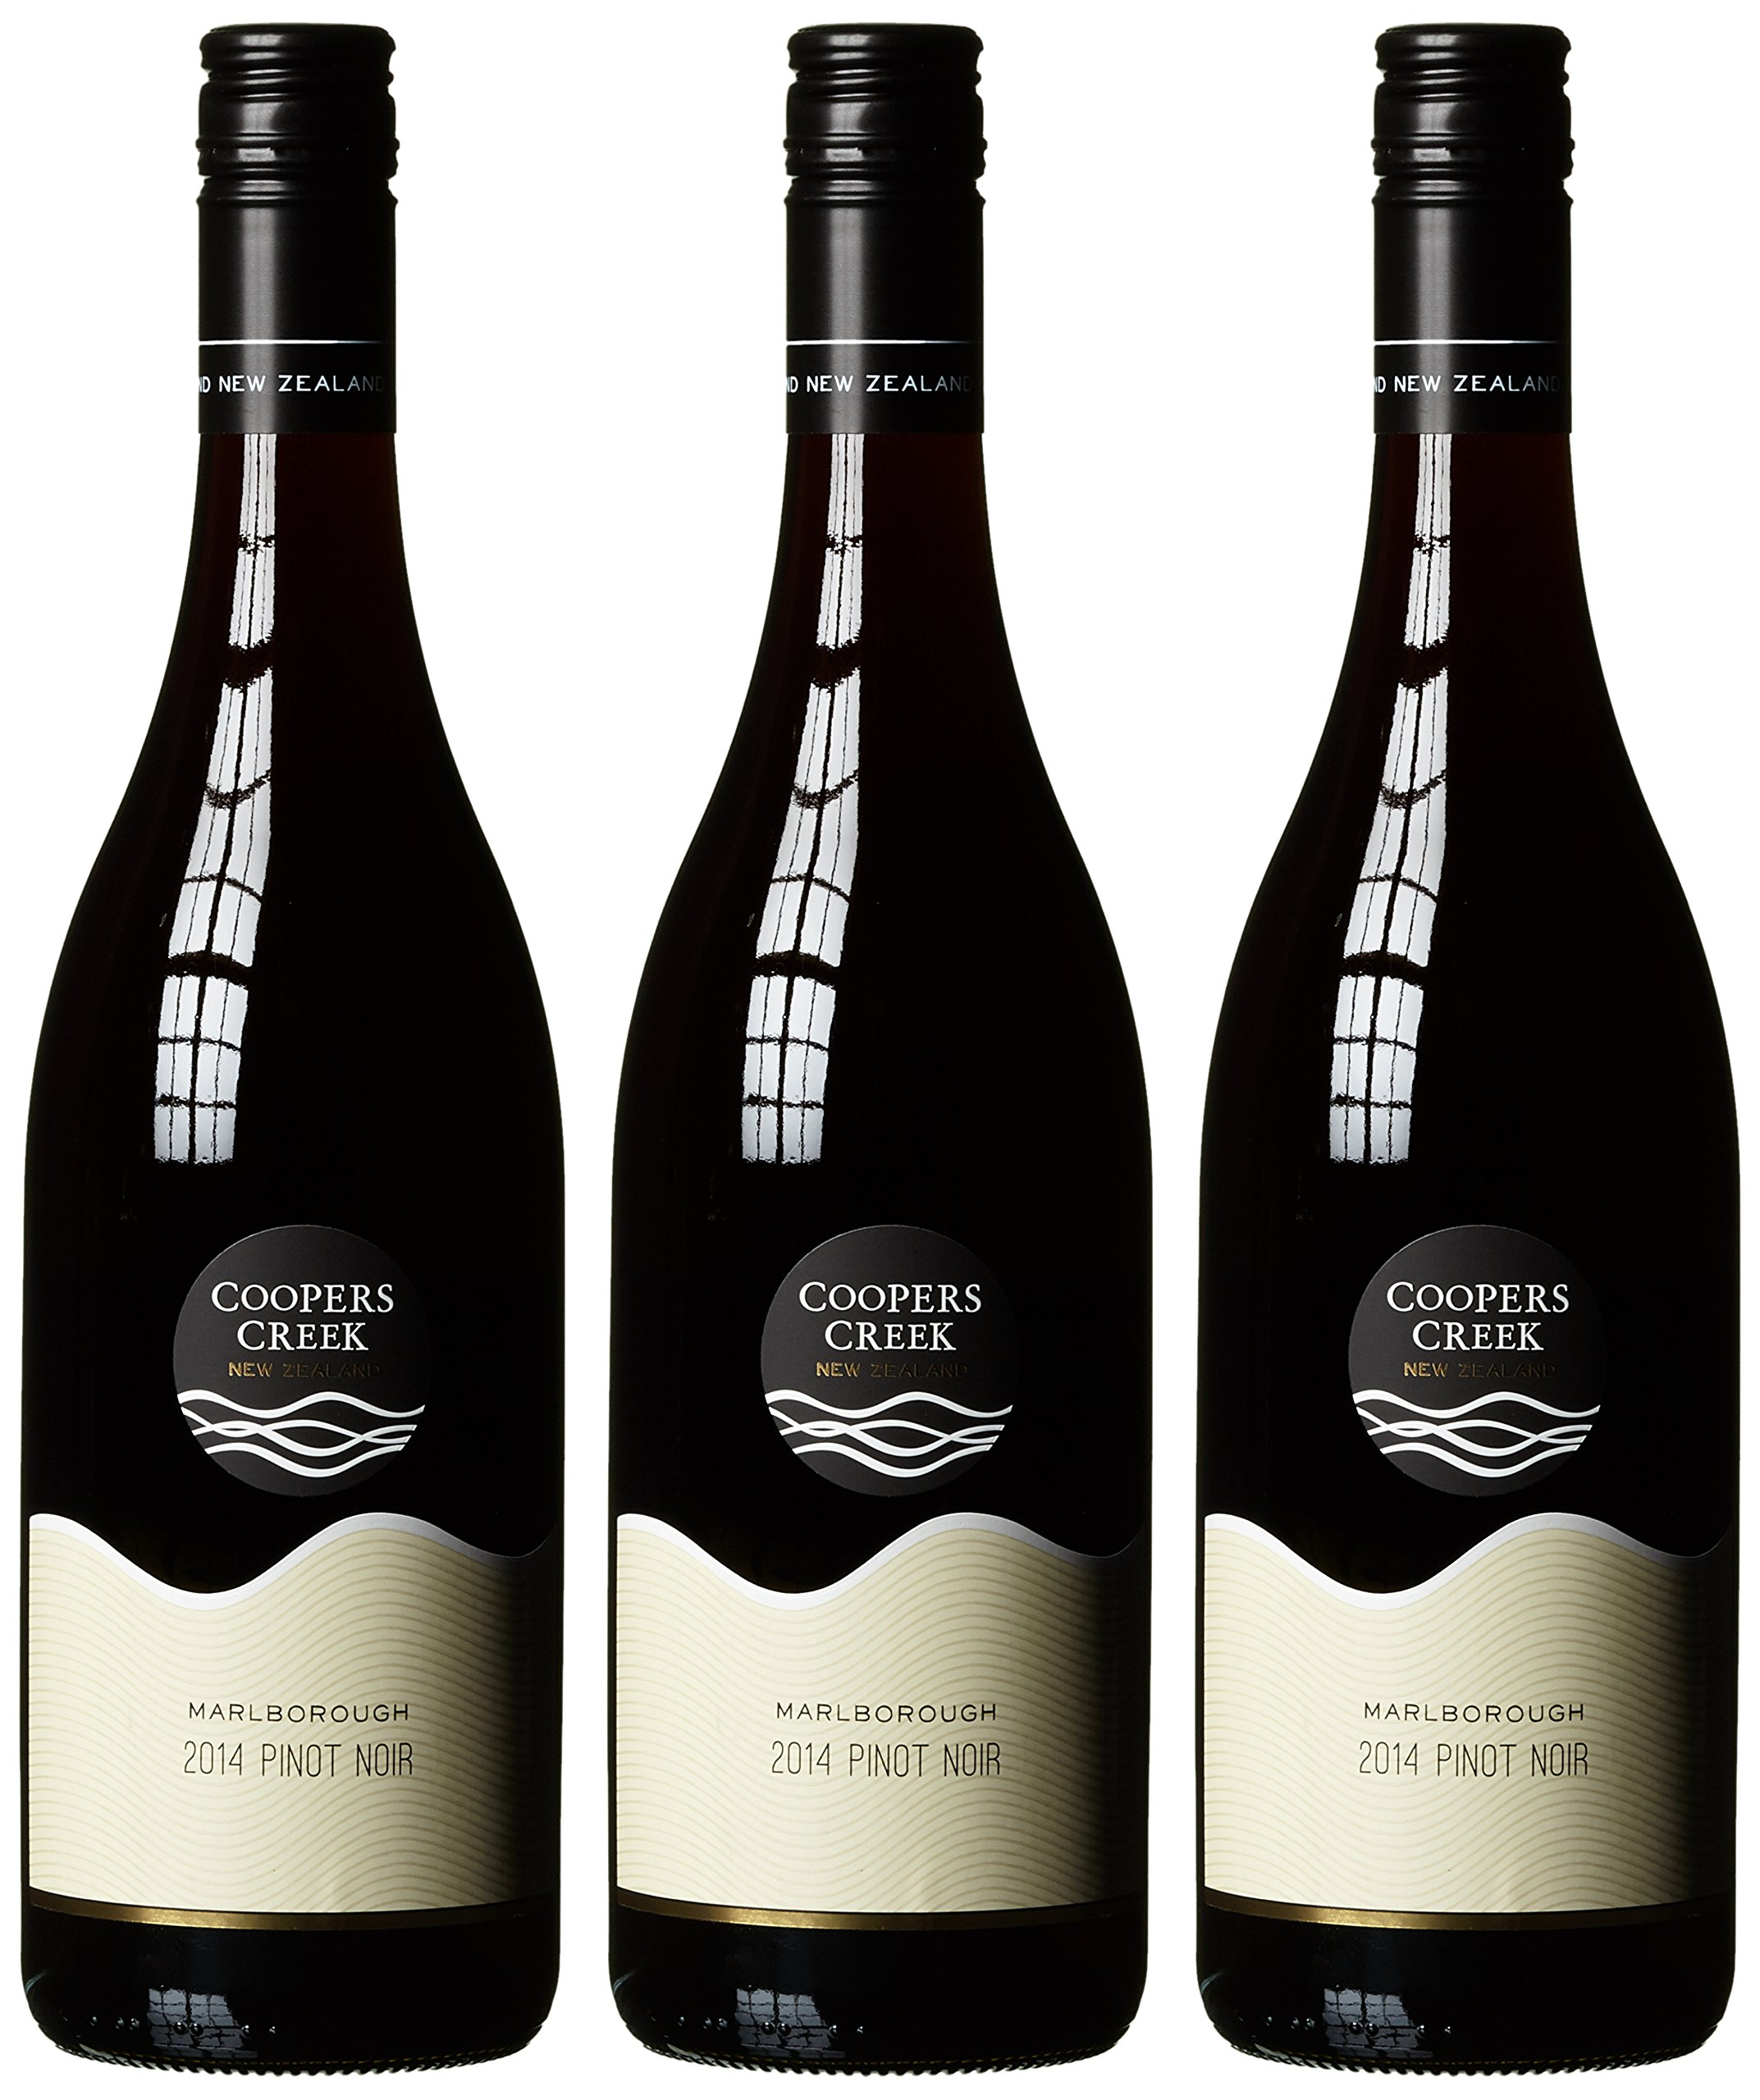 Coopers-Creek-Marlborough-Pinot-Noir-Sptburgunder-2013-trocken-3-x-075-l